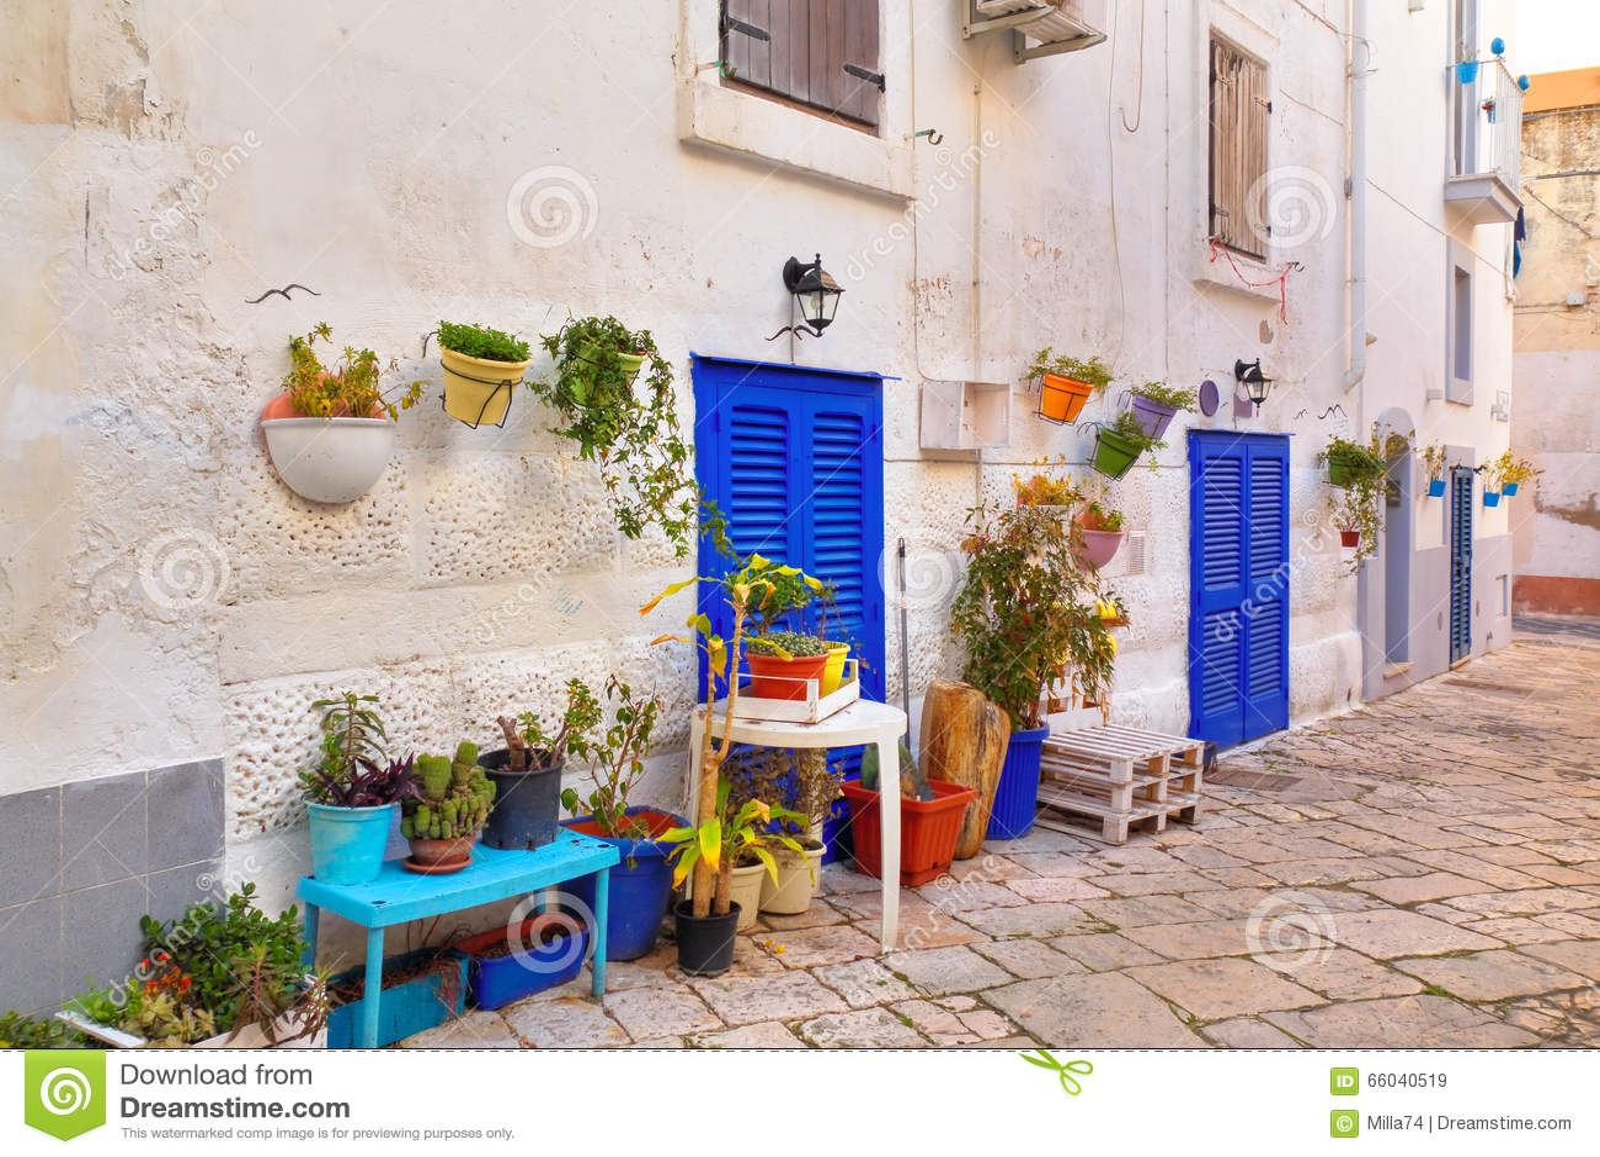 Alleyway Monopoli Puglia Italy